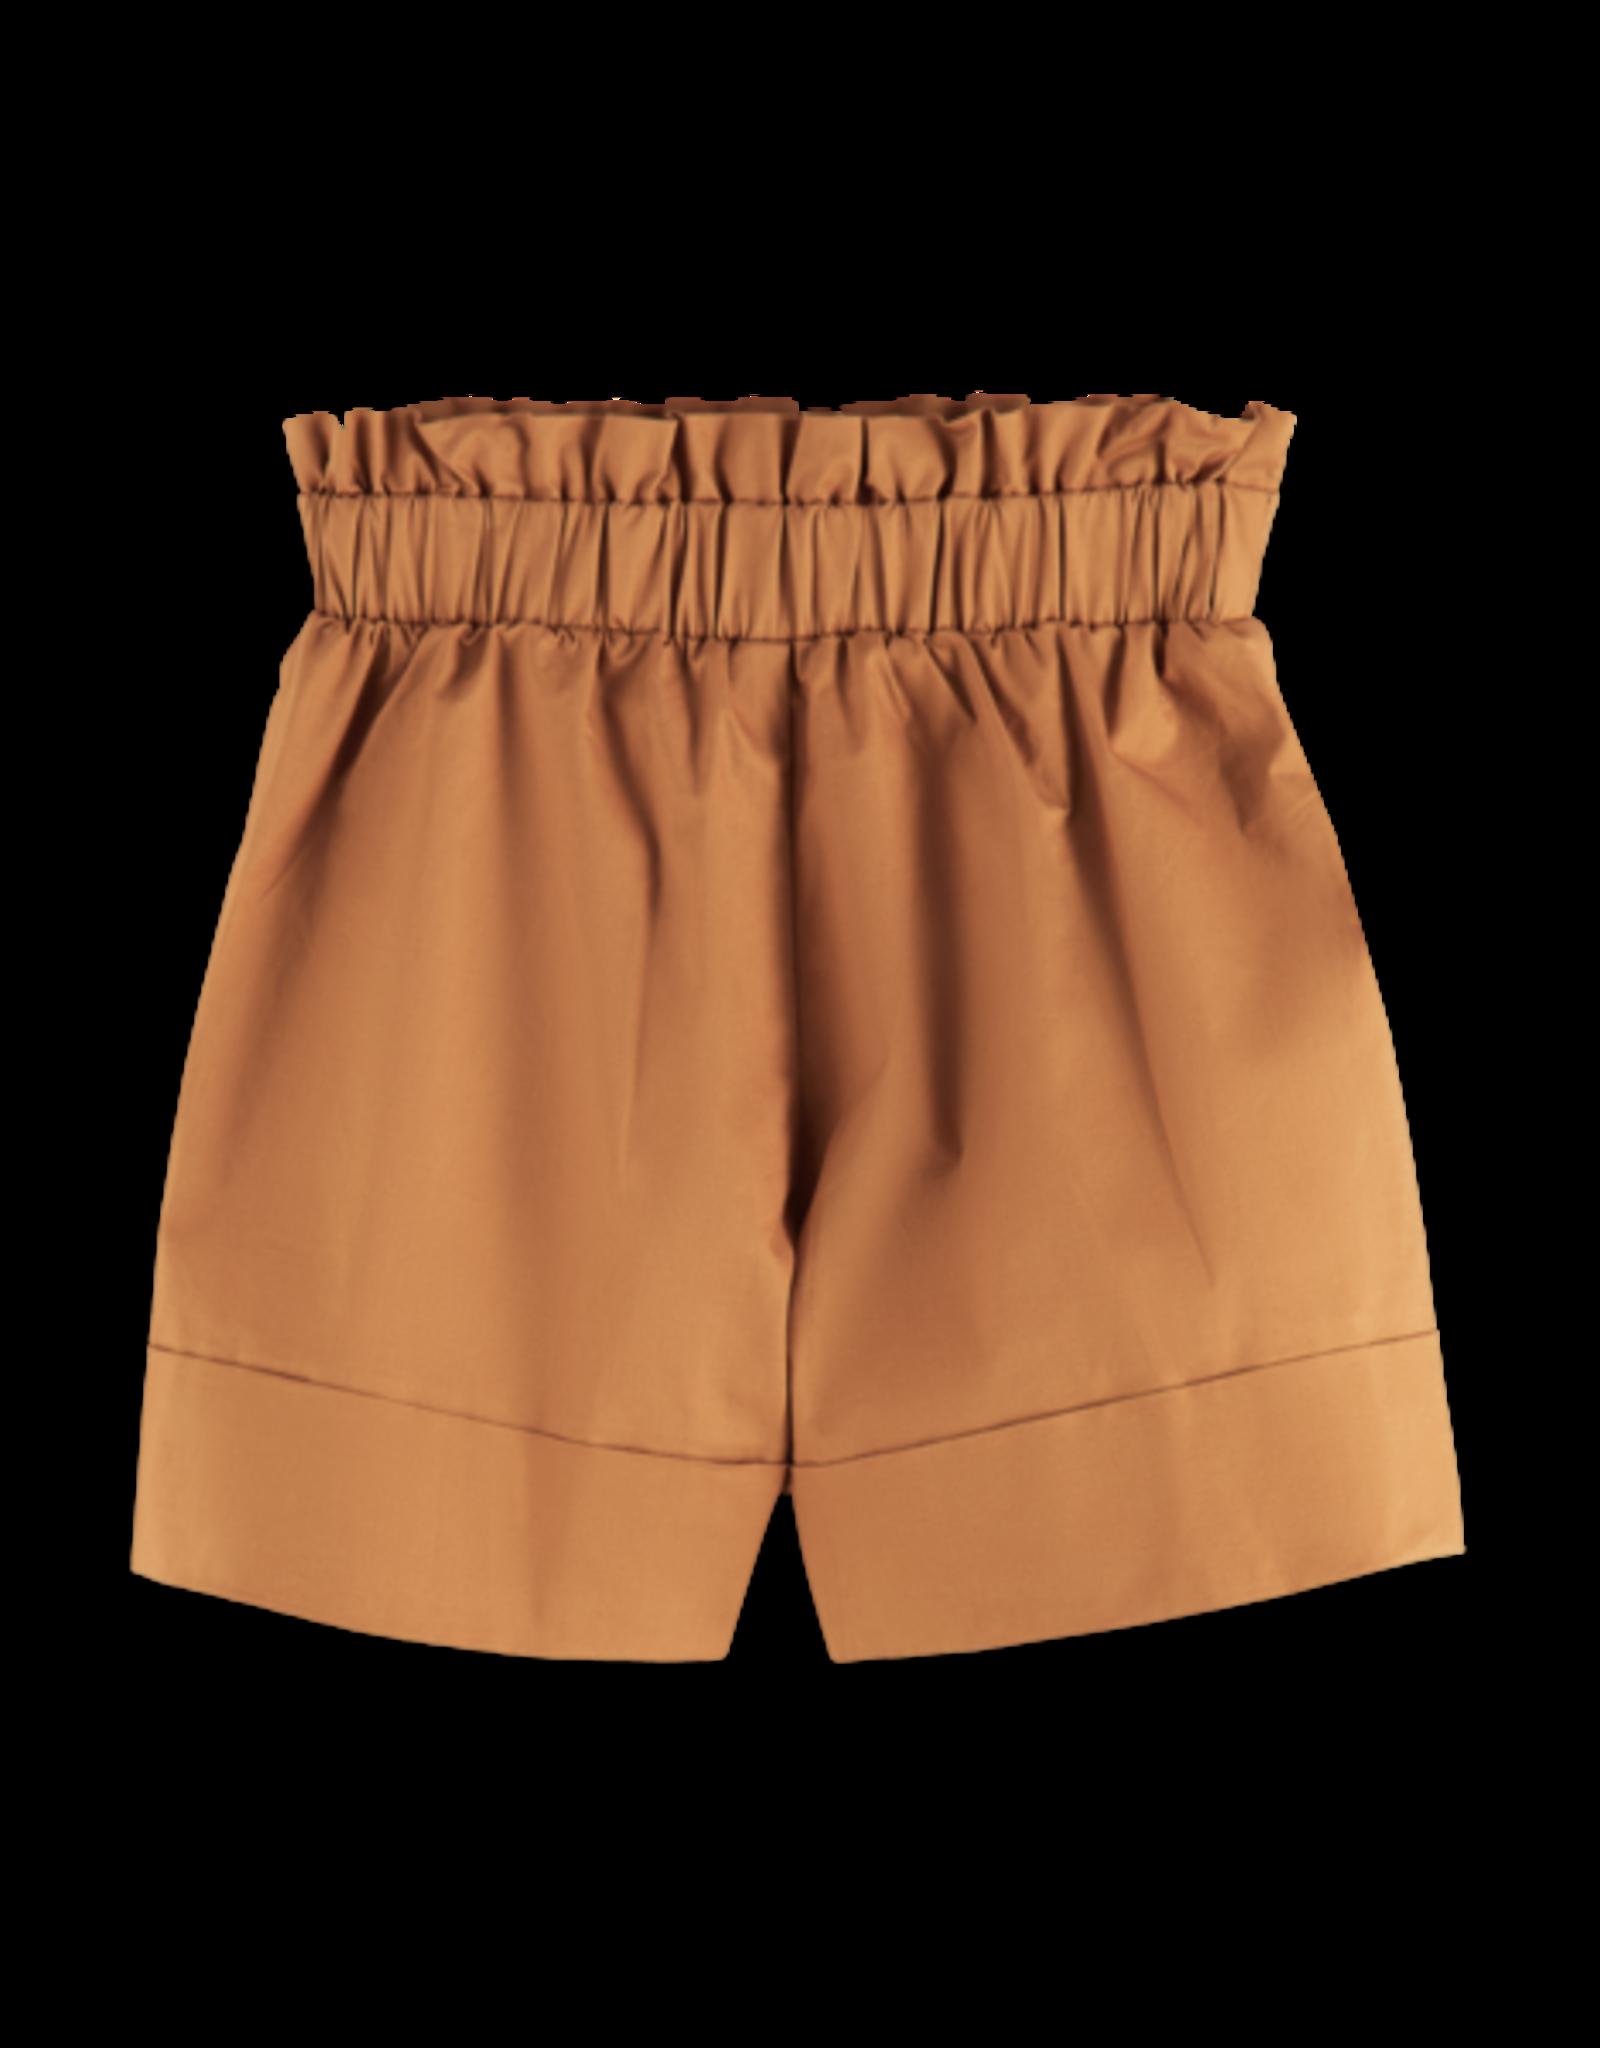 Scotch&Soda R'belle SS21 161261 shorts